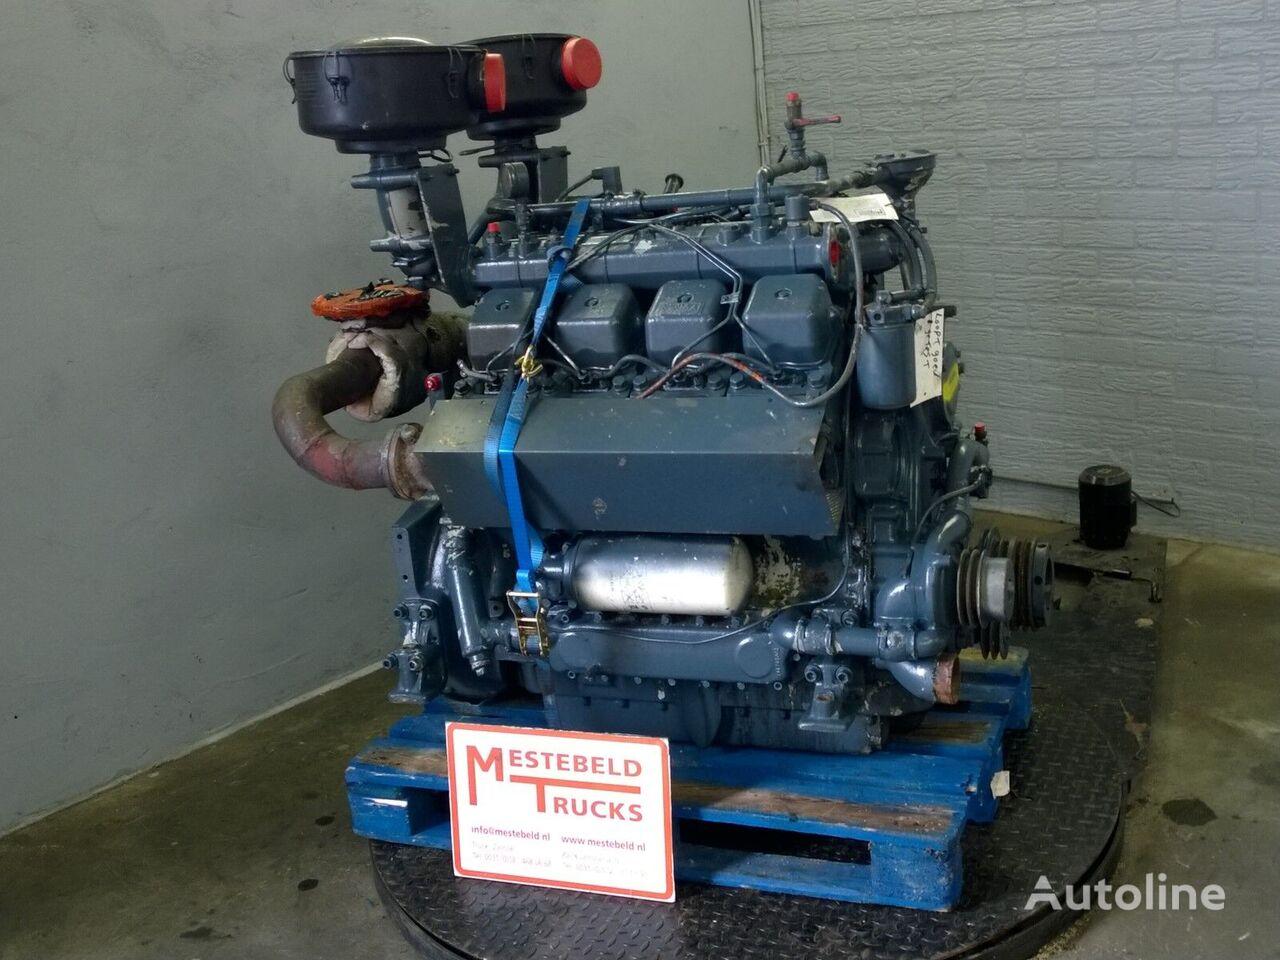 двигатель  MWM D234 V8 для тягача Motor MWM D234 V8